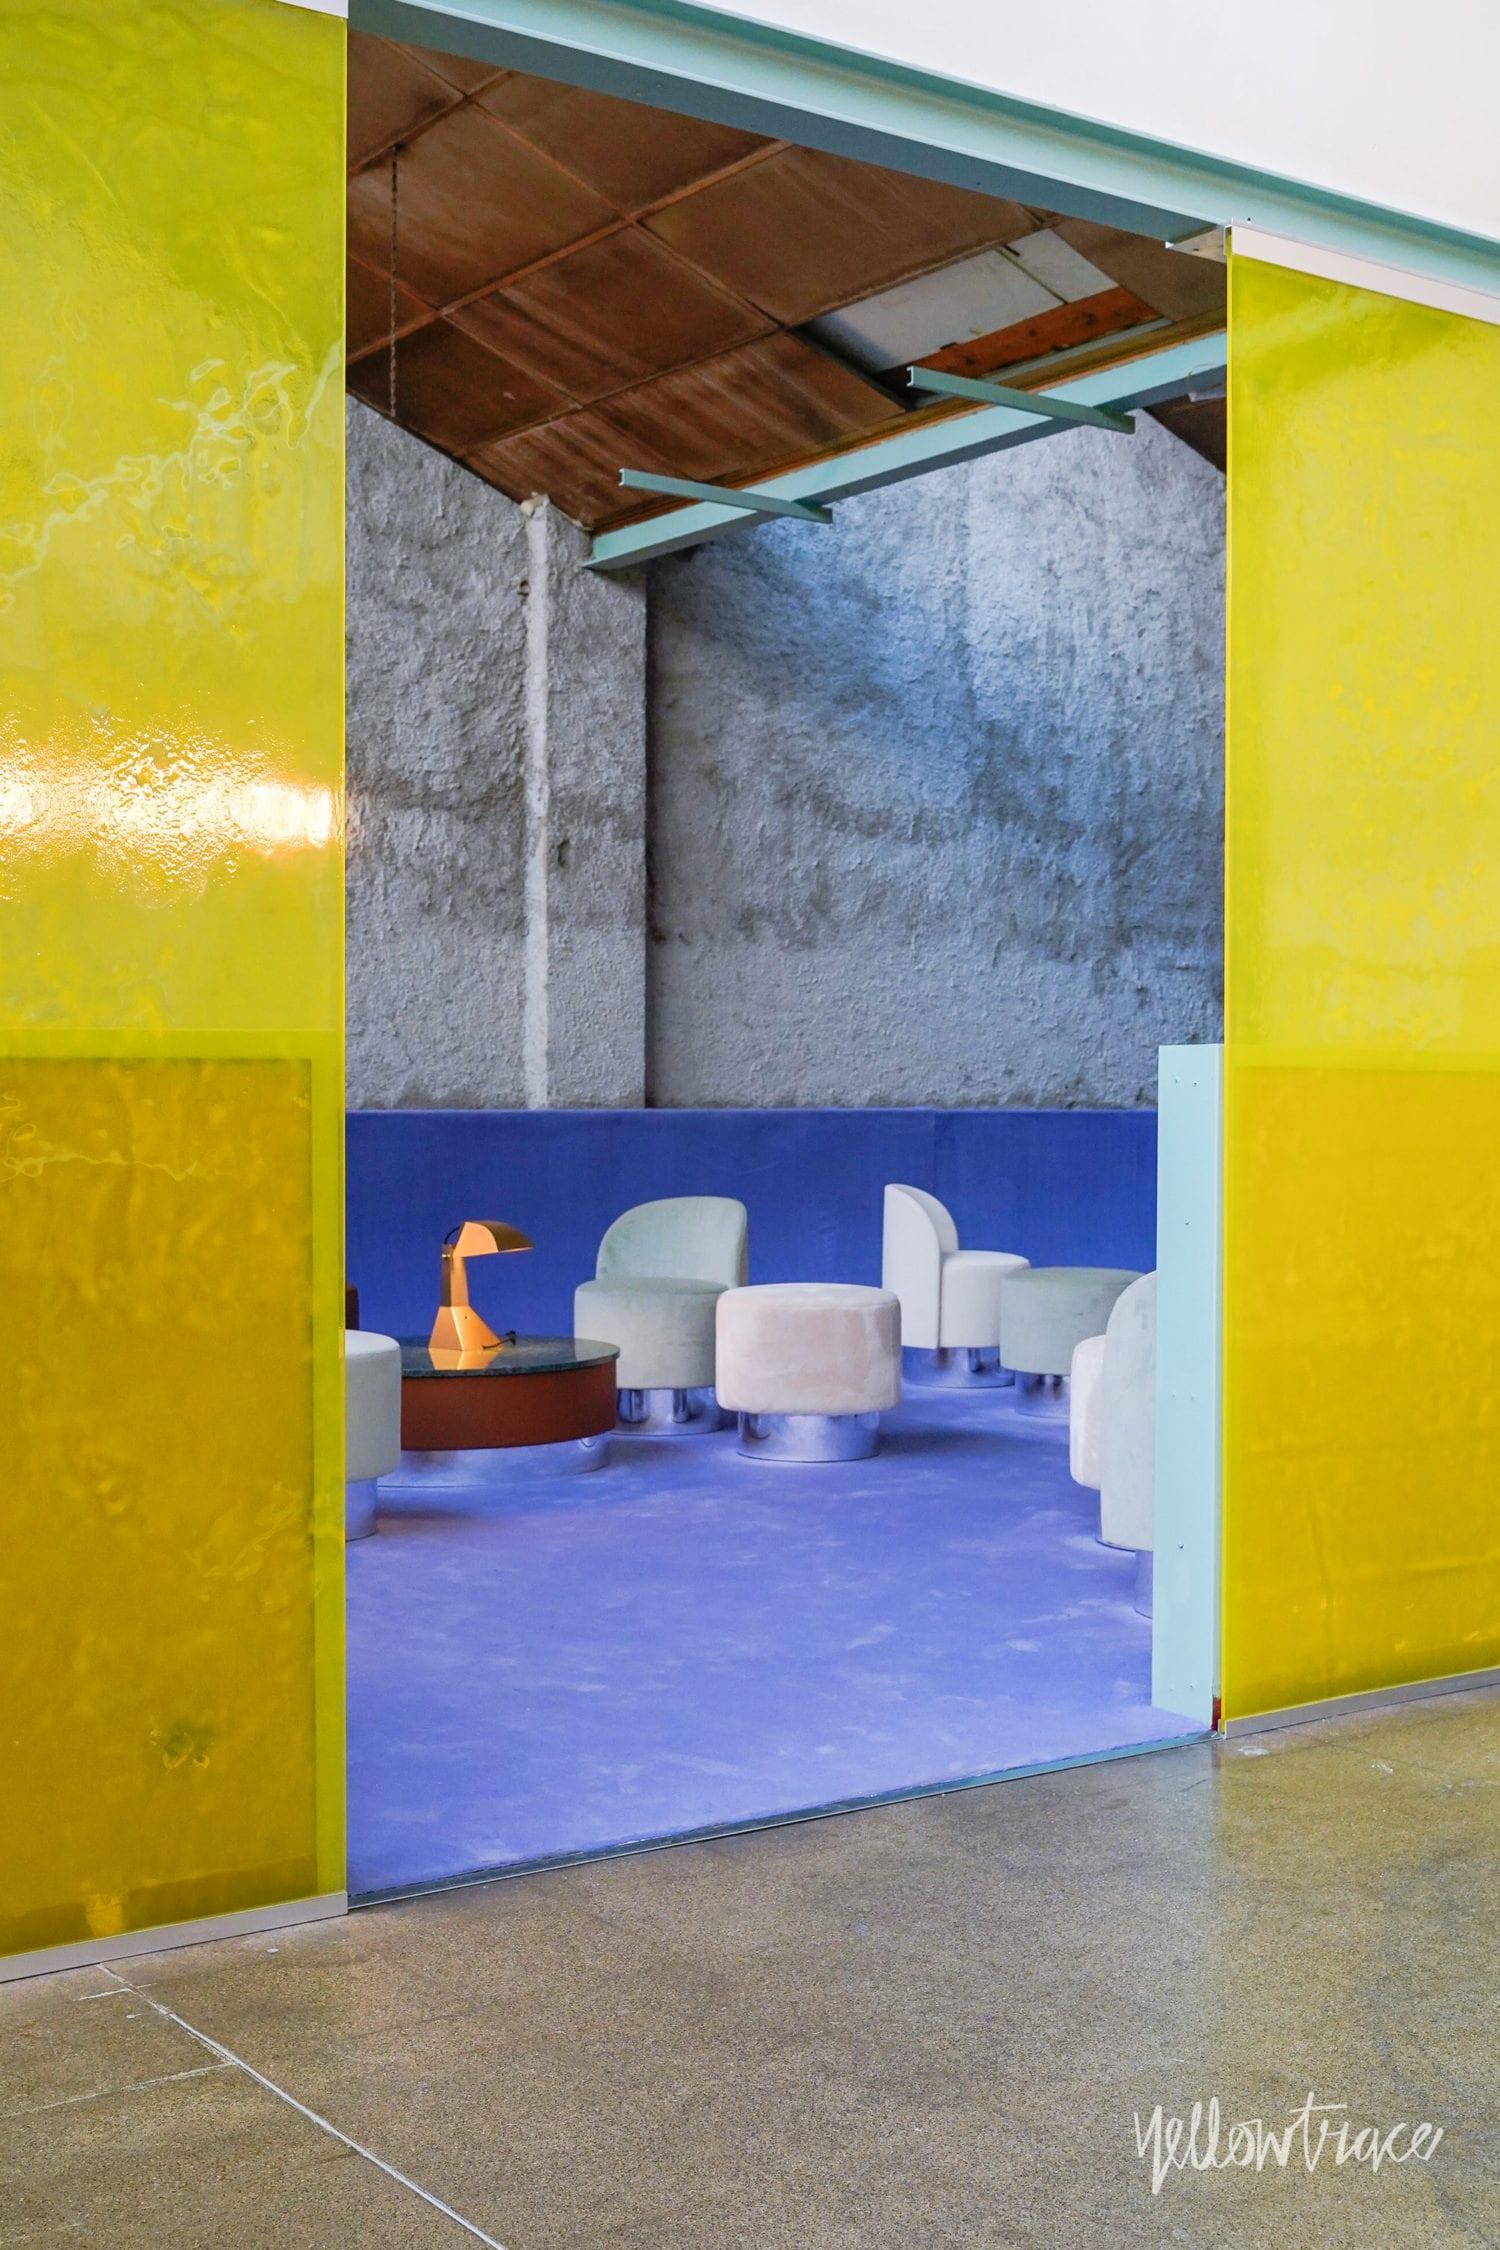 Les Arcanistes Studiopepe At Milan Design Week 2019 Photo Nick Hughes Yellowtrace 18